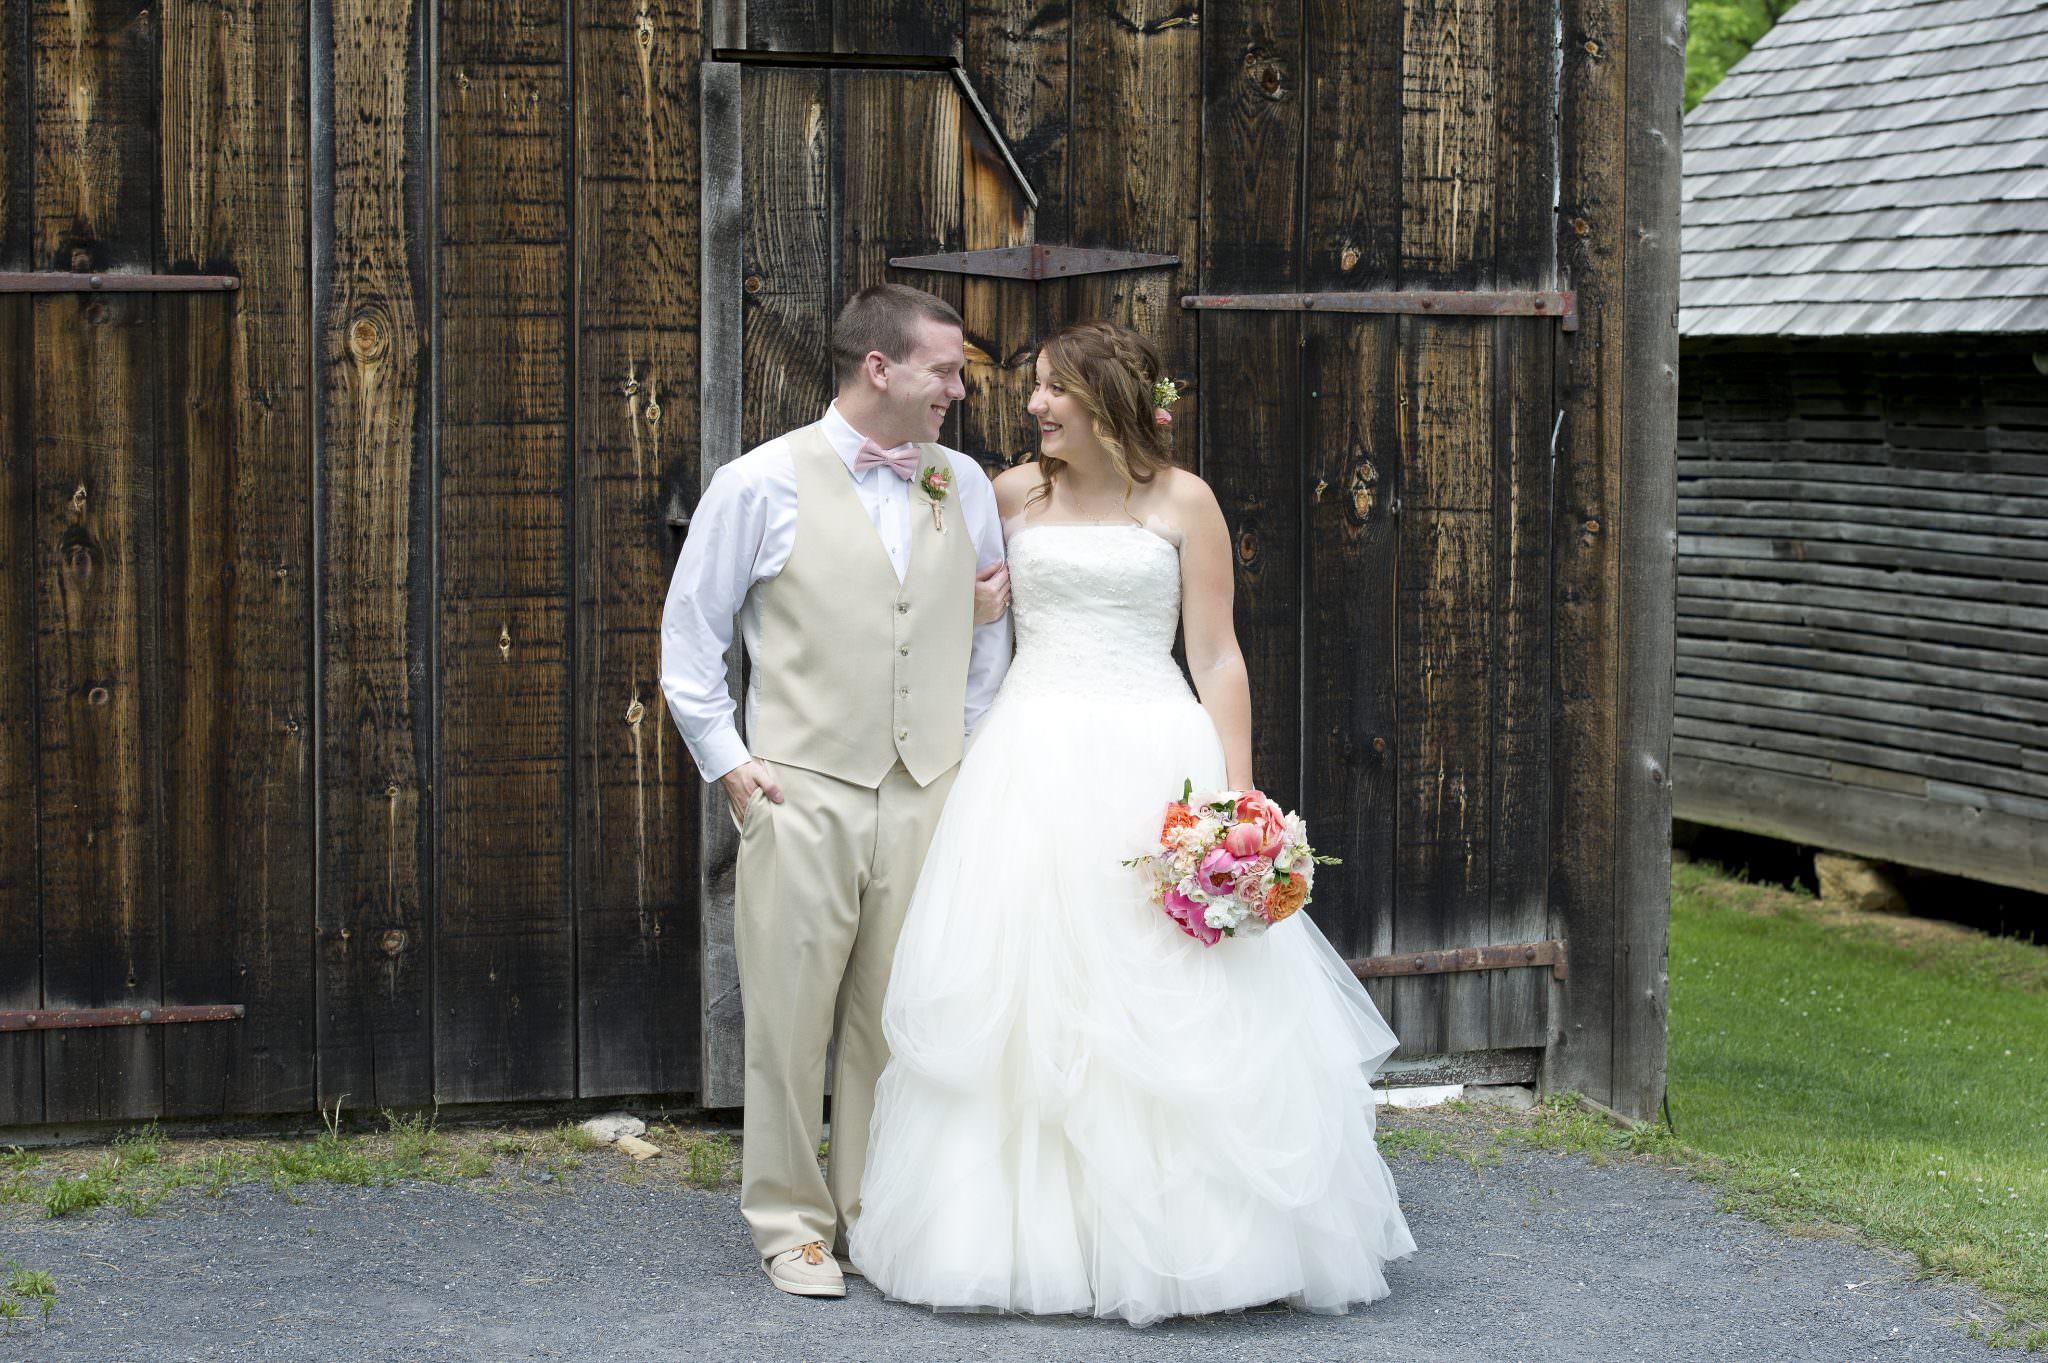 Rustic Spring Wedding Bride and Groom photo